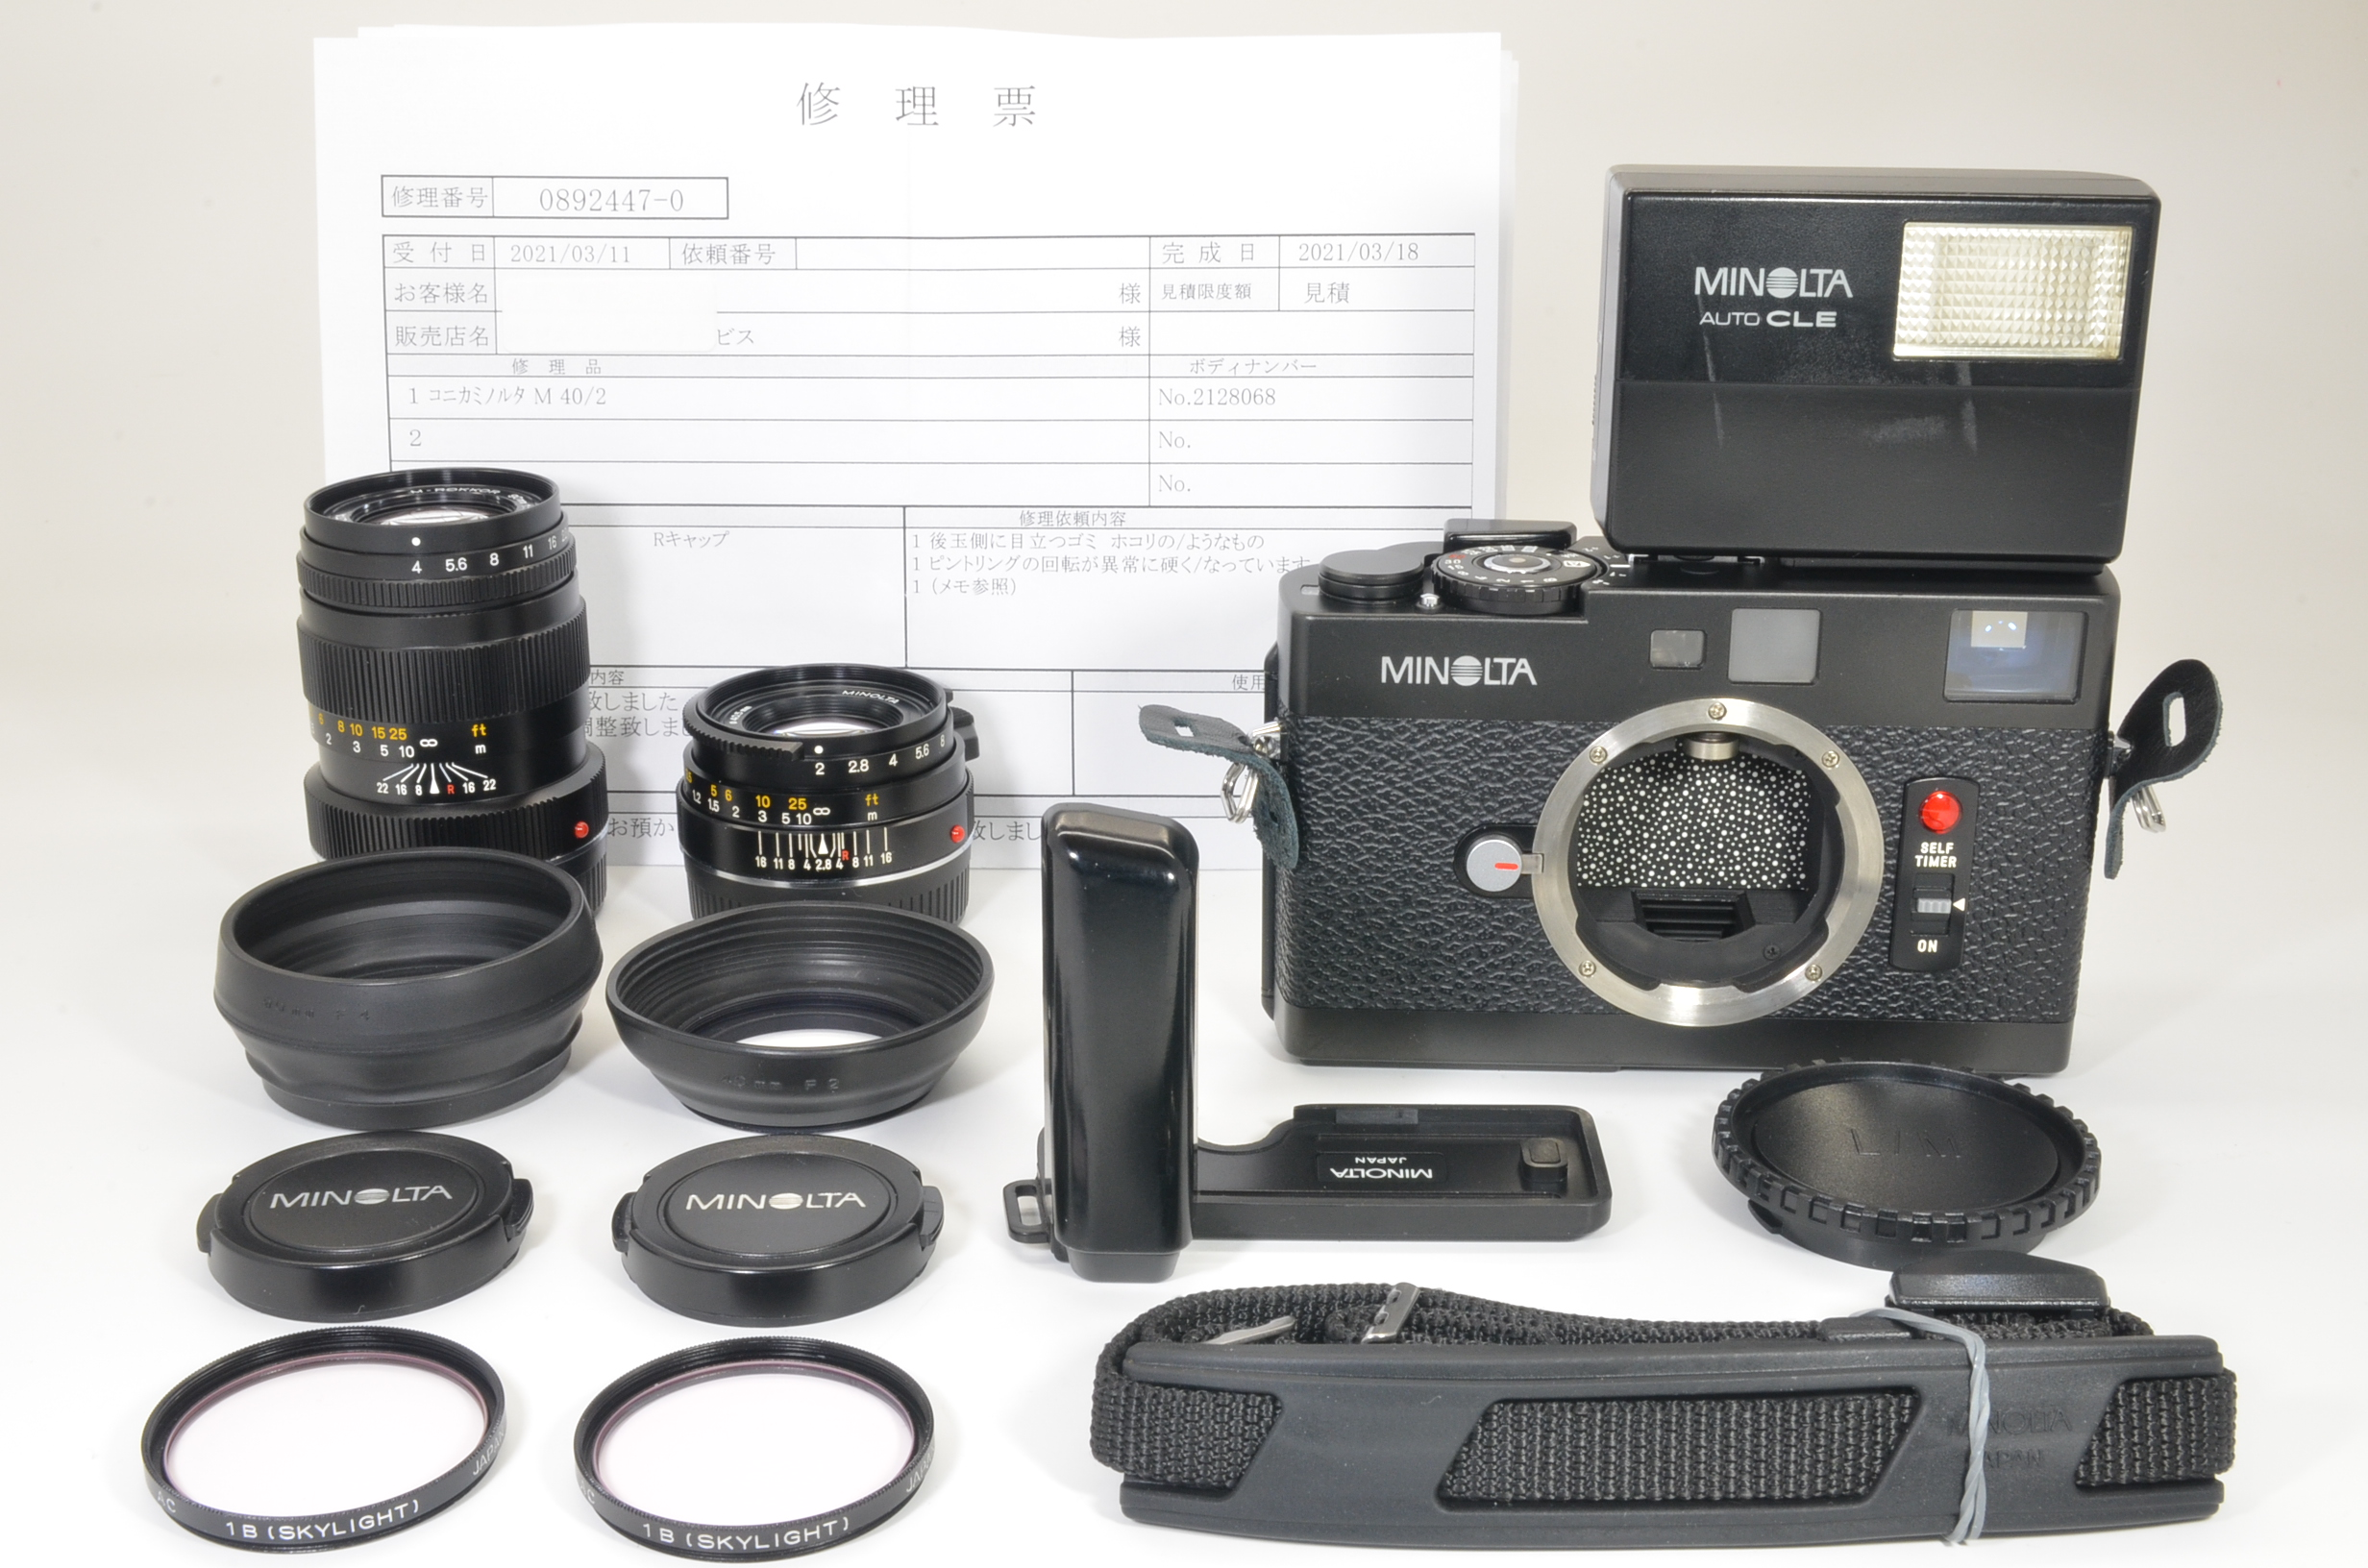 minolta cle film camera, m-rokkor lenses 40mm, 90mm, flash, grip film tested